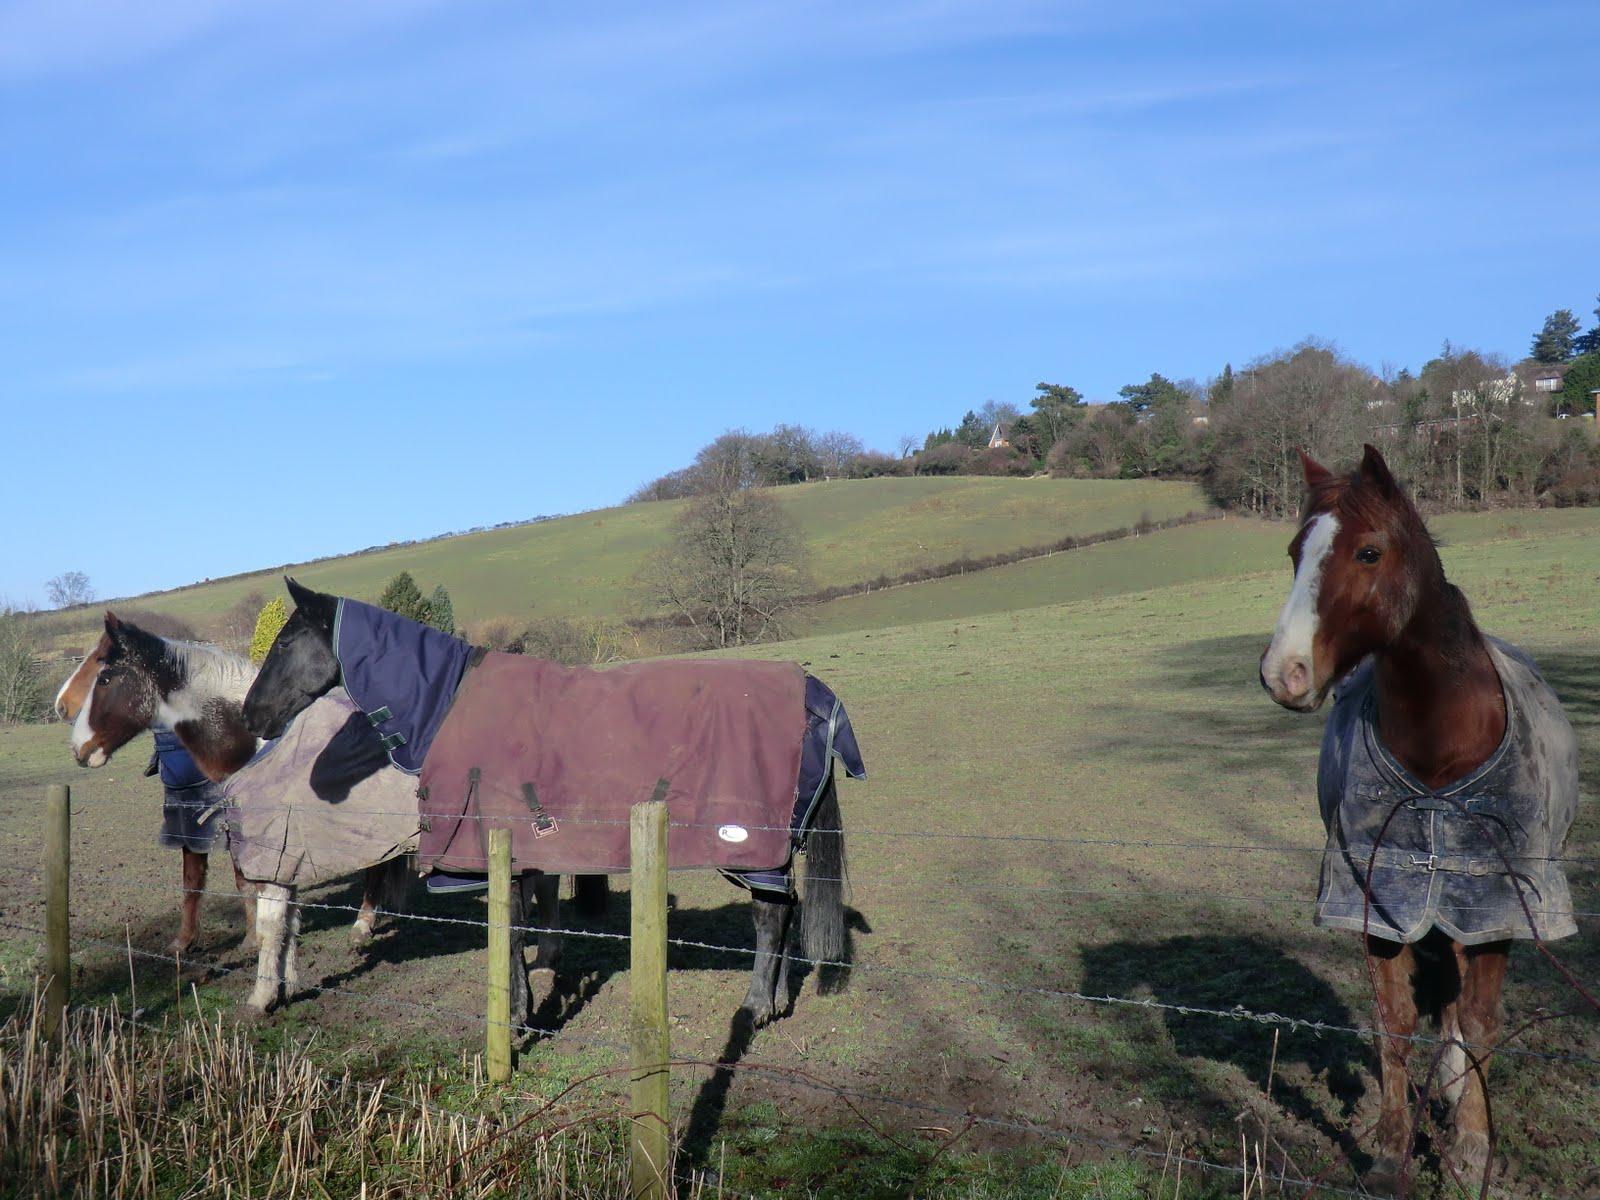 CIMG5127 Horses on Church Road